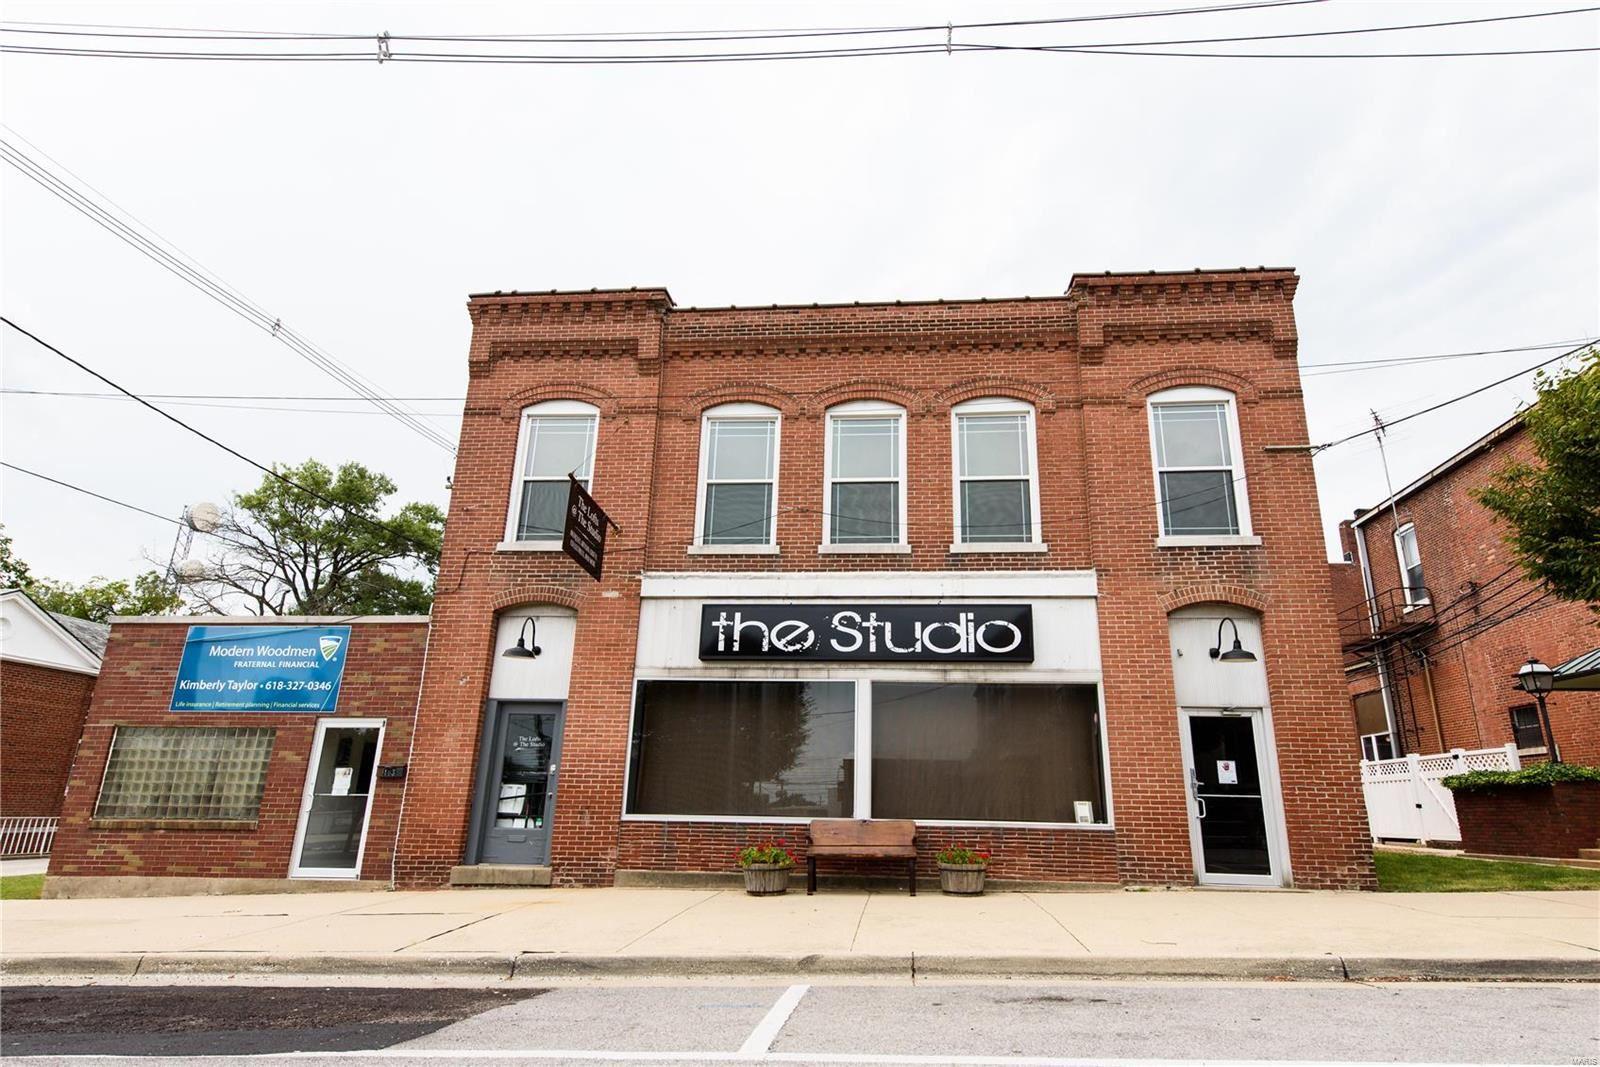 Photo for 153 S. Kaskaskia, Nashville, IL 62263 (MLS # 20047620)